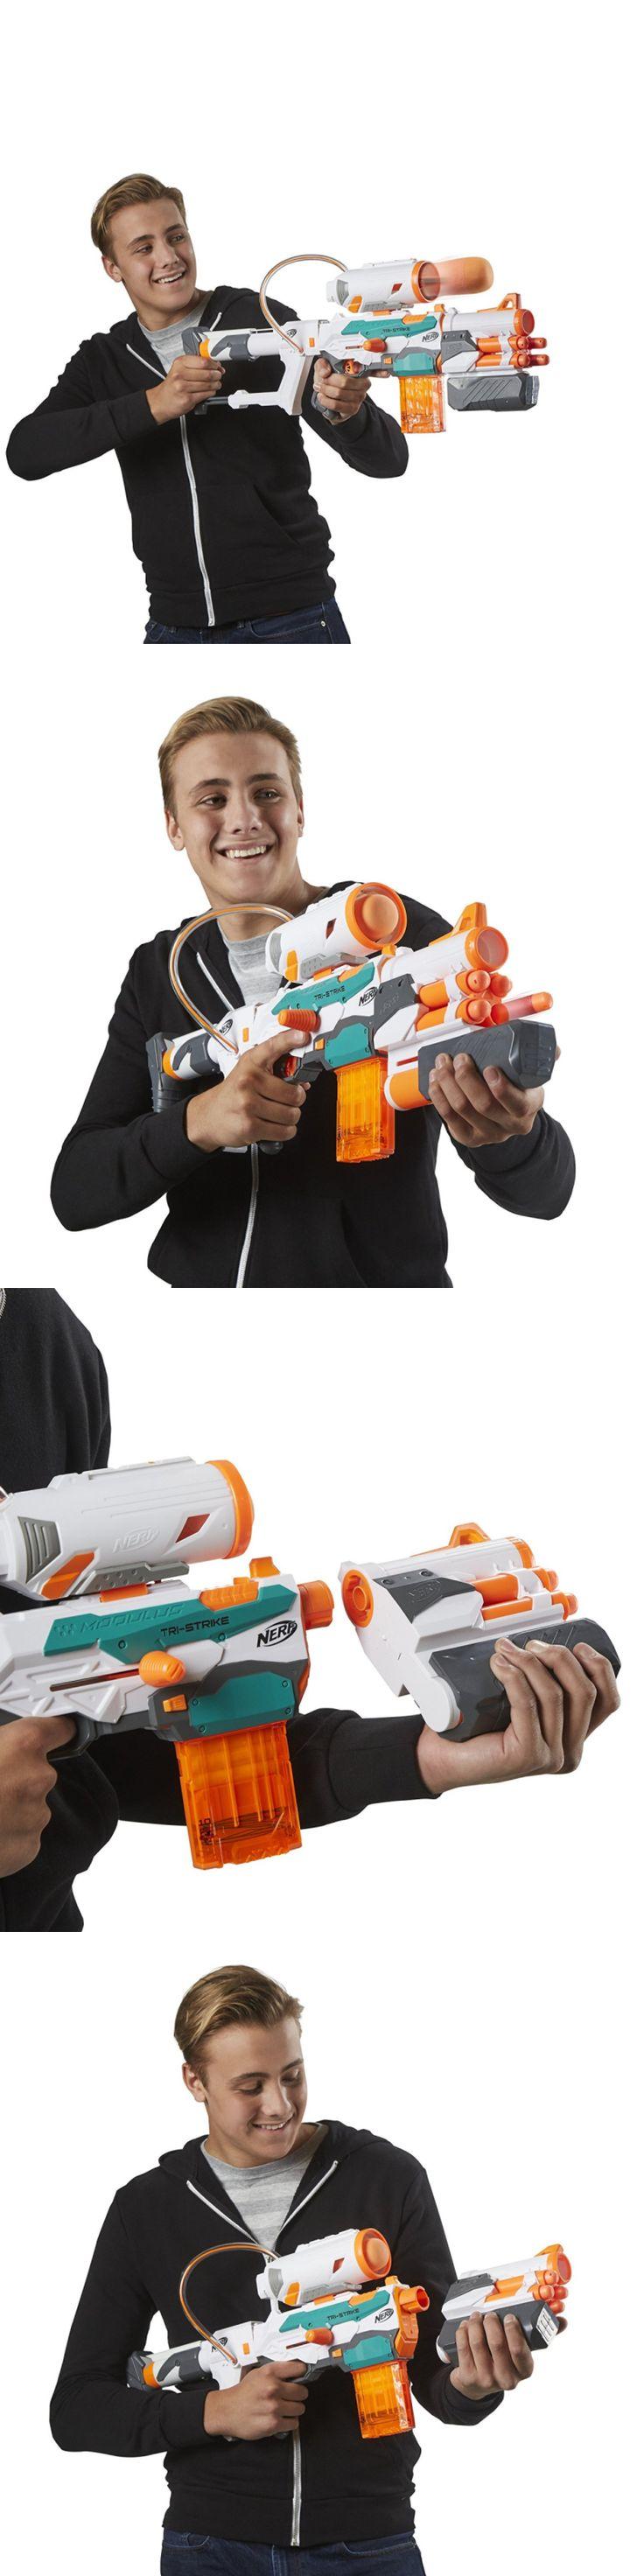 Toy box metal decor wall art shop play children store a180 ebay - Dart Guns And Soft Darts 158749 Nerf N Strike Modulus Tri Strike Blaster